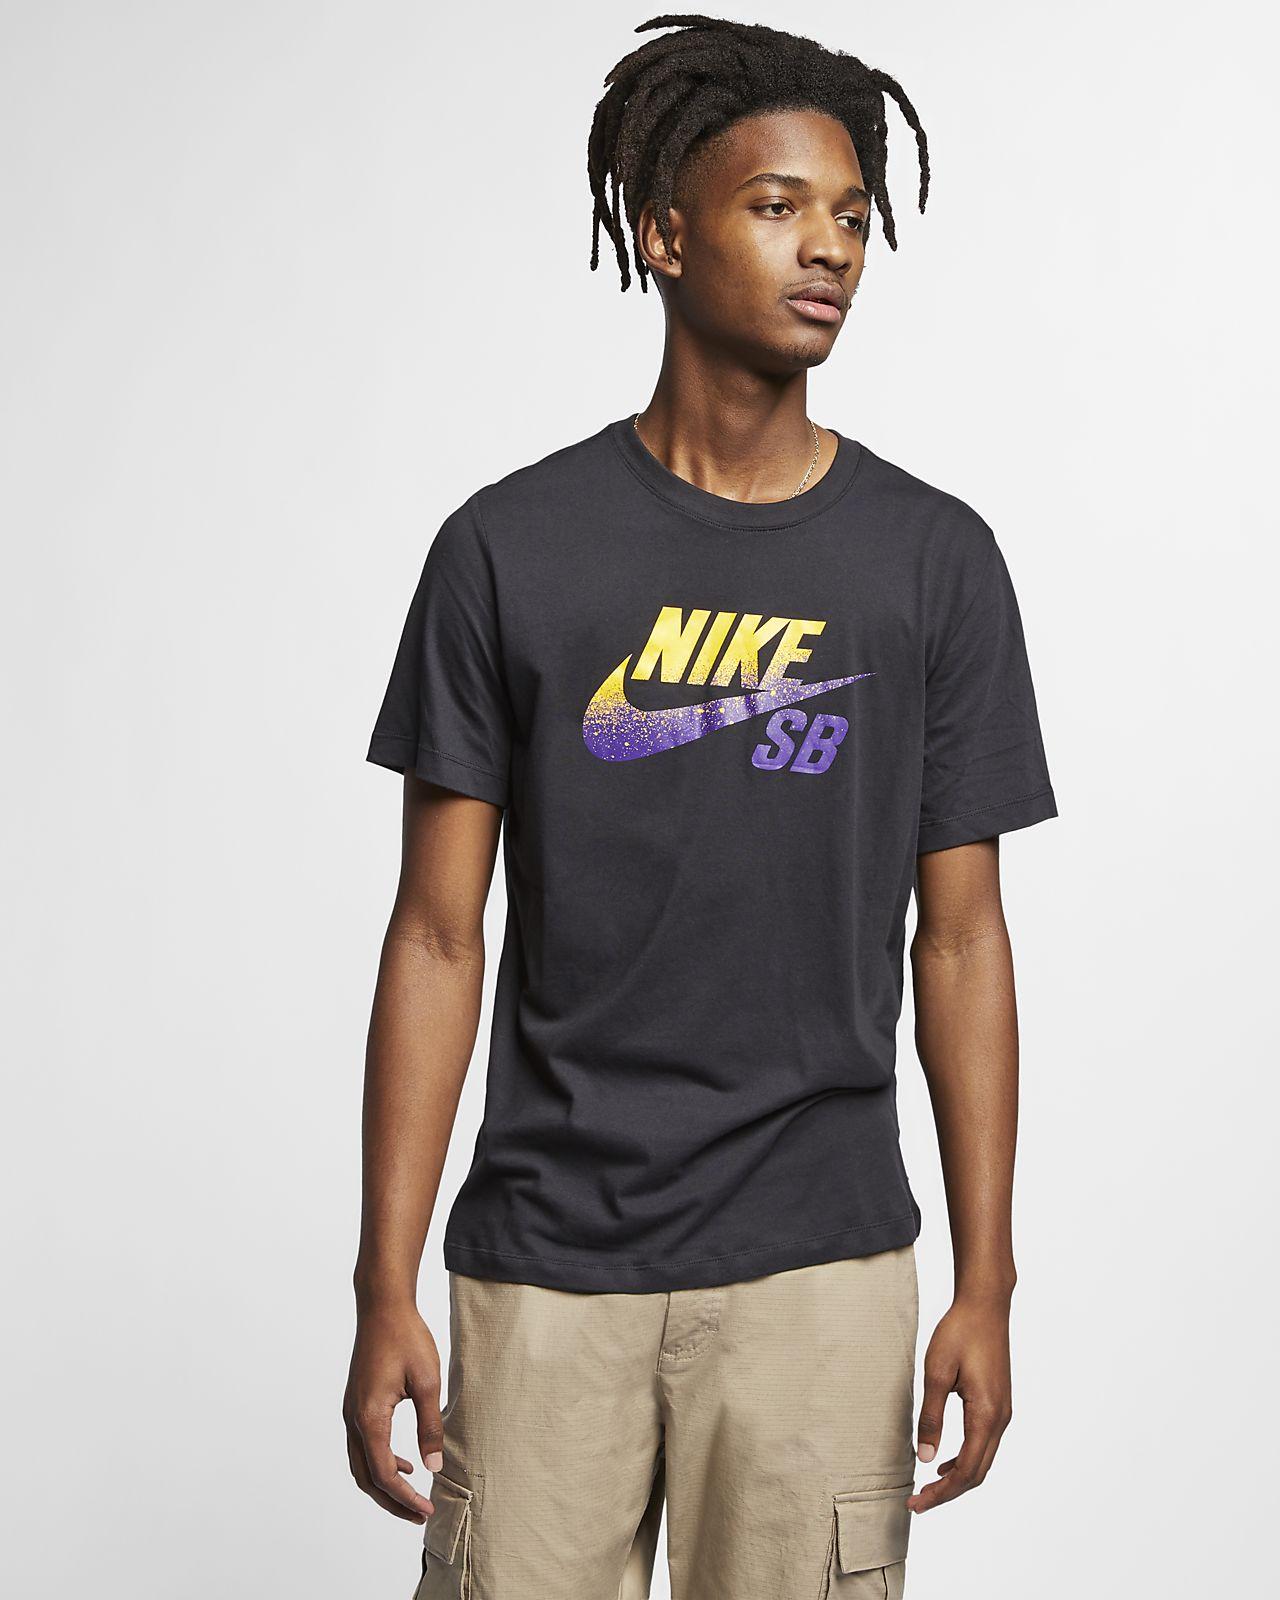 Skateboard Logo Sb Homme De Fit À Dri Shirt Pour Tee Nike Be OYEwITq